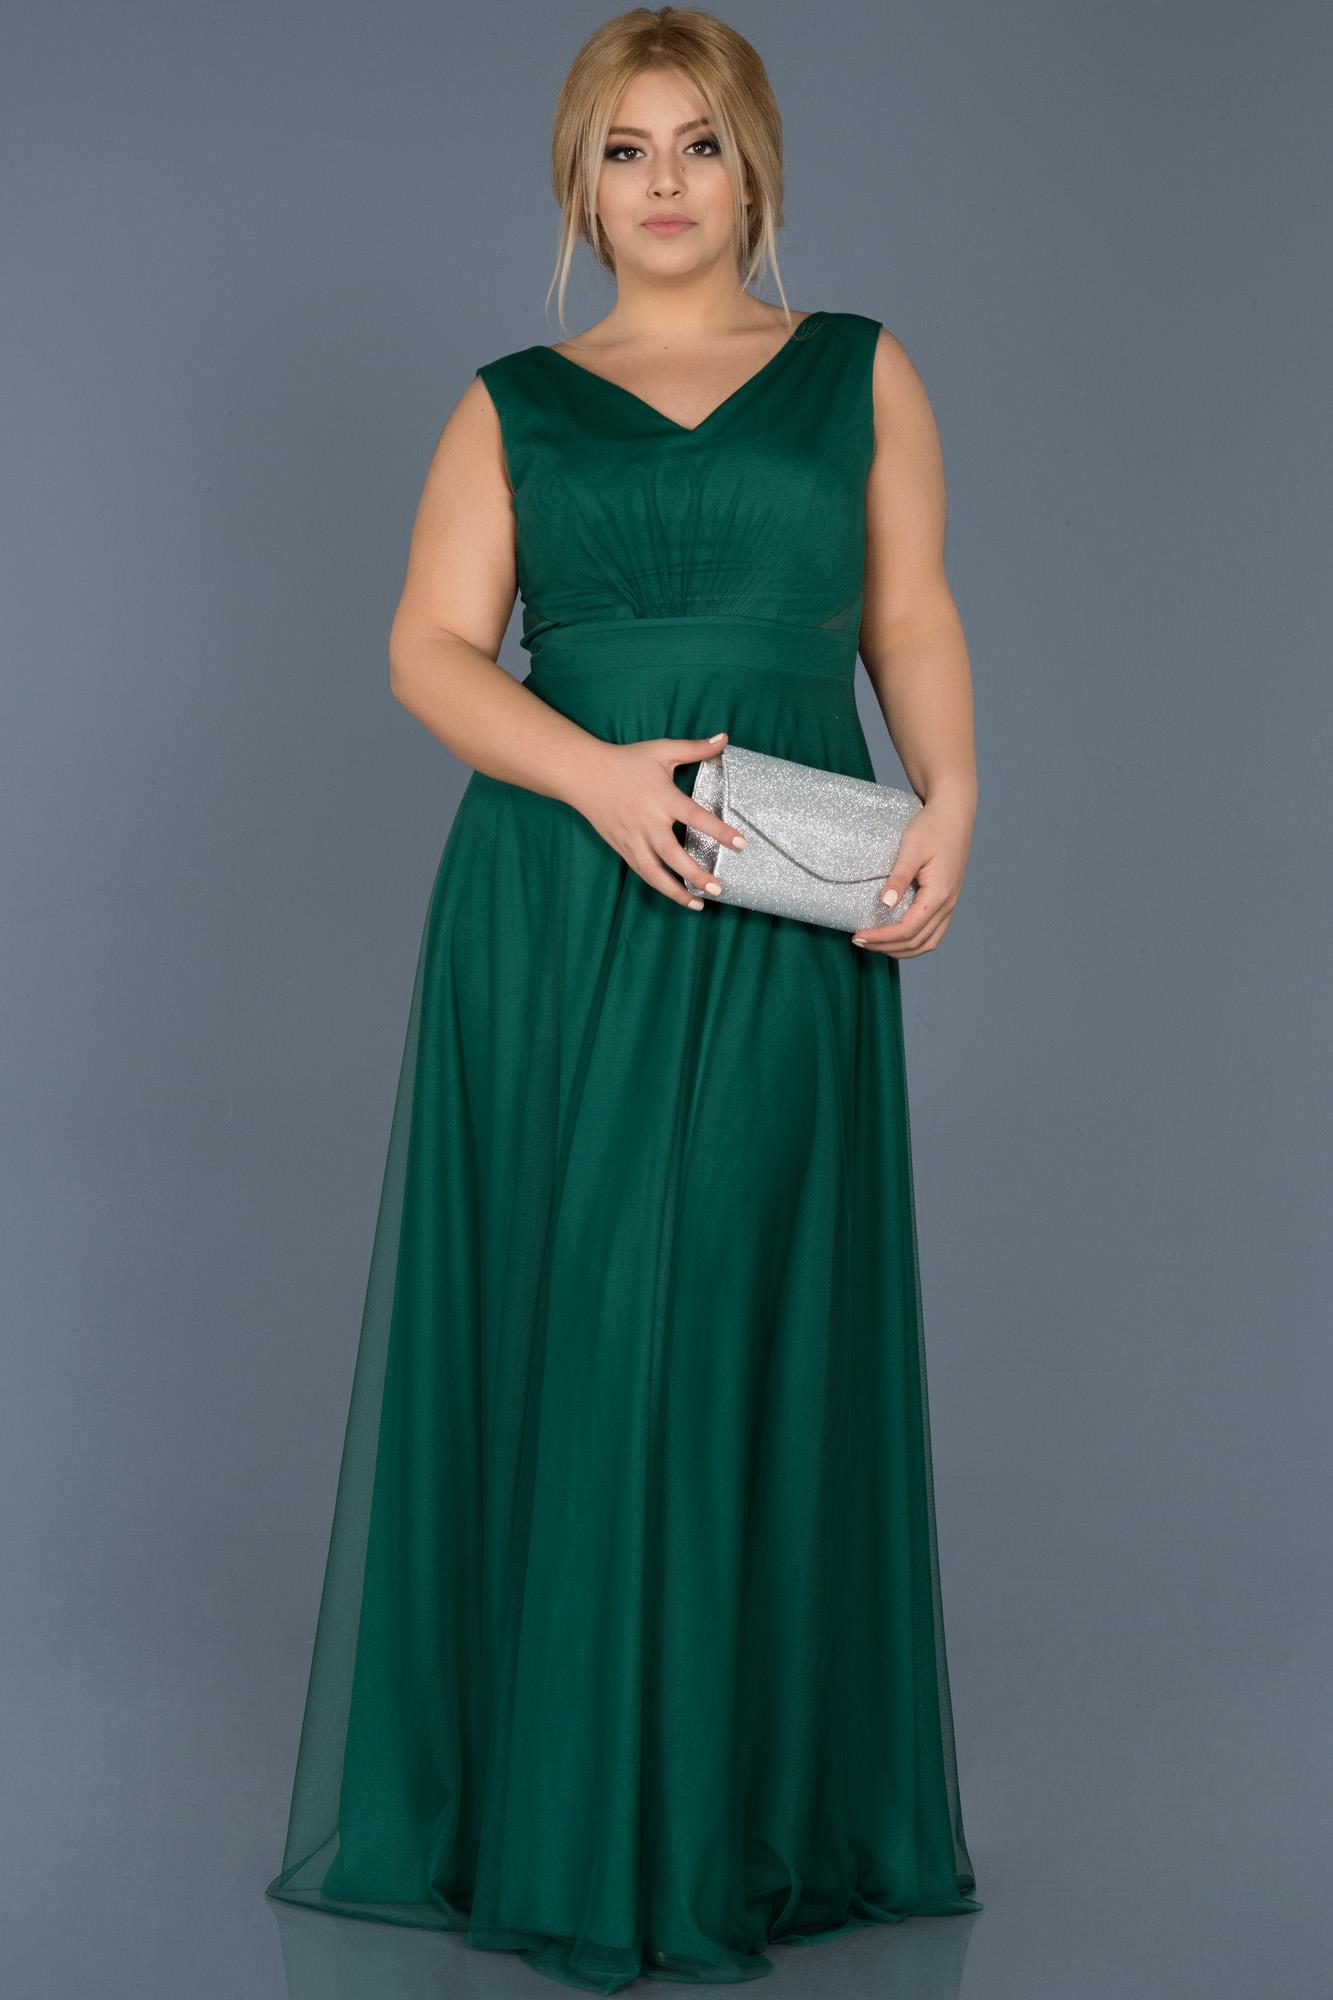 Emerald Green Evening Dress Plus Size